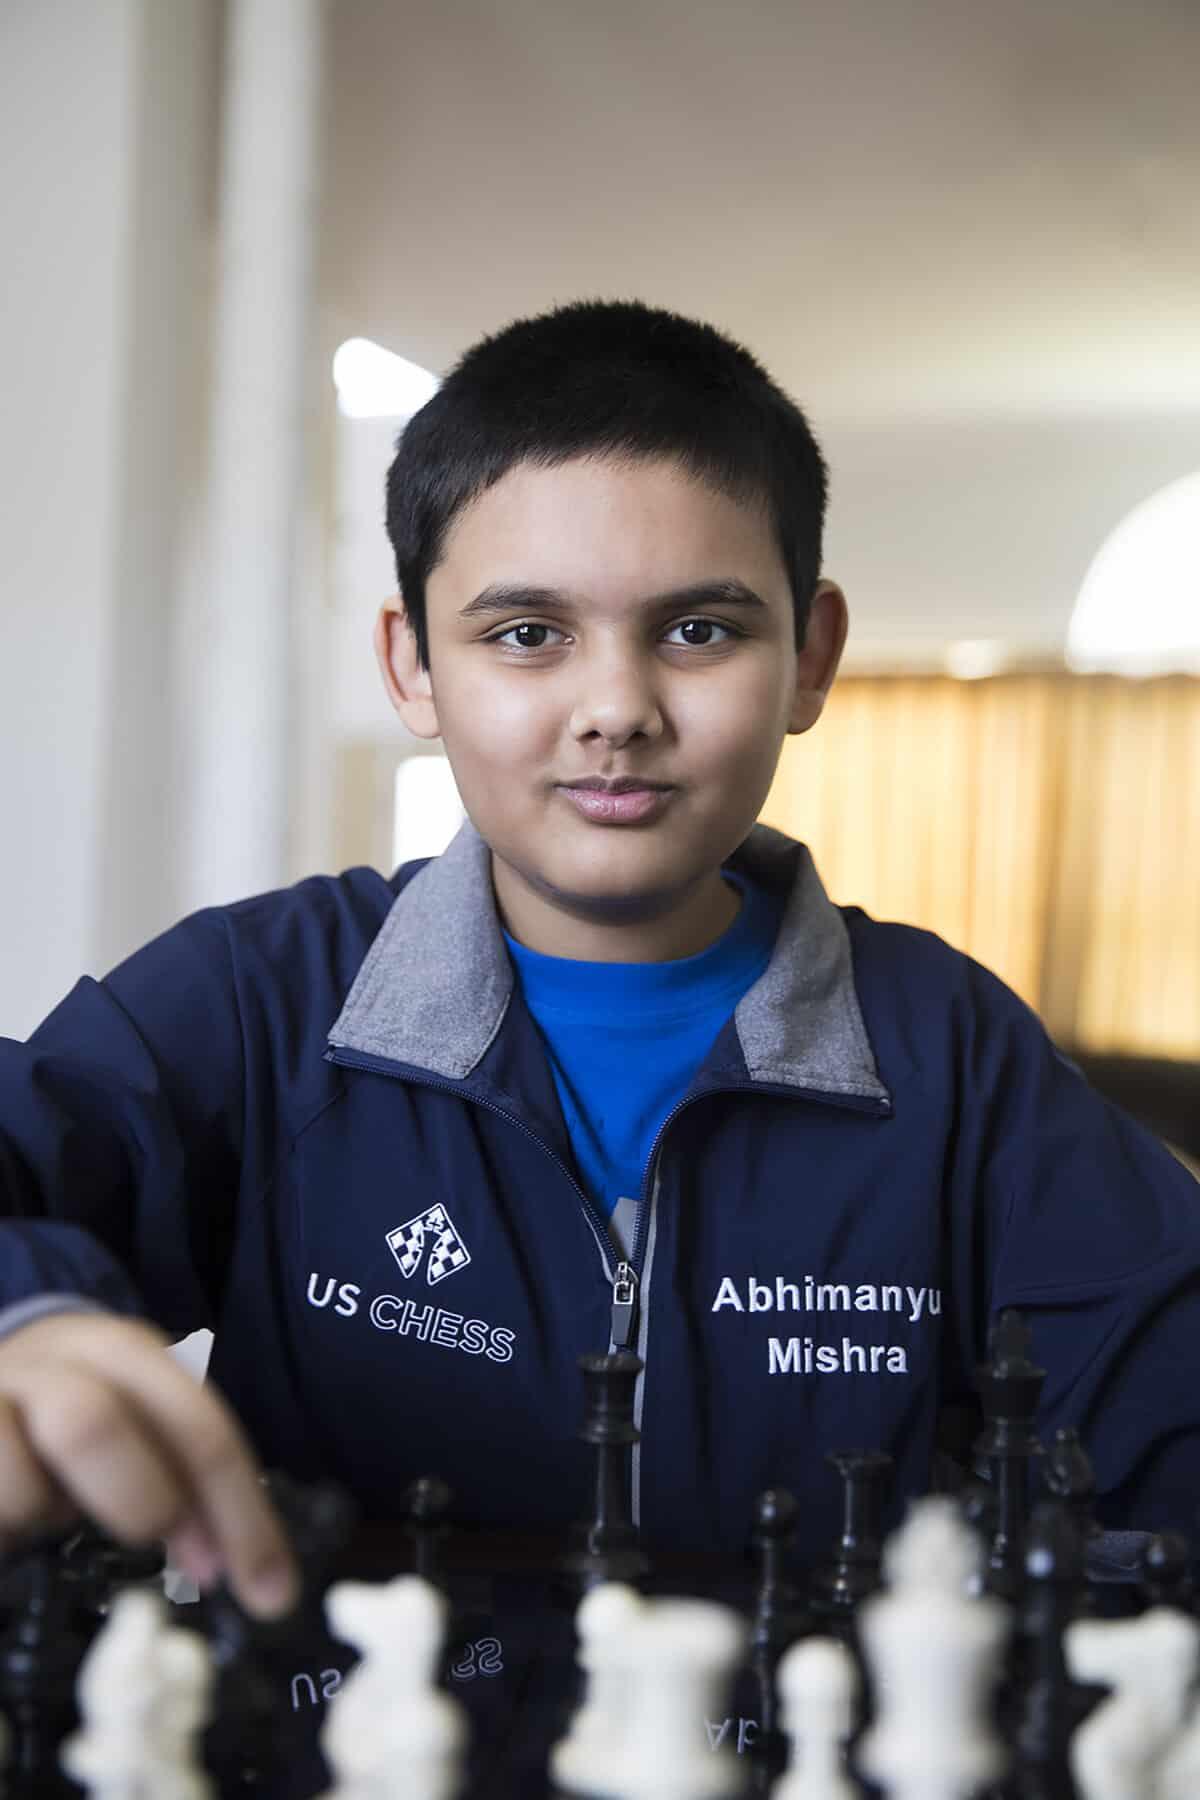 Mishra-by-Justin-N.-Lane-courtesy-of-US-Chess-1-1200x1800